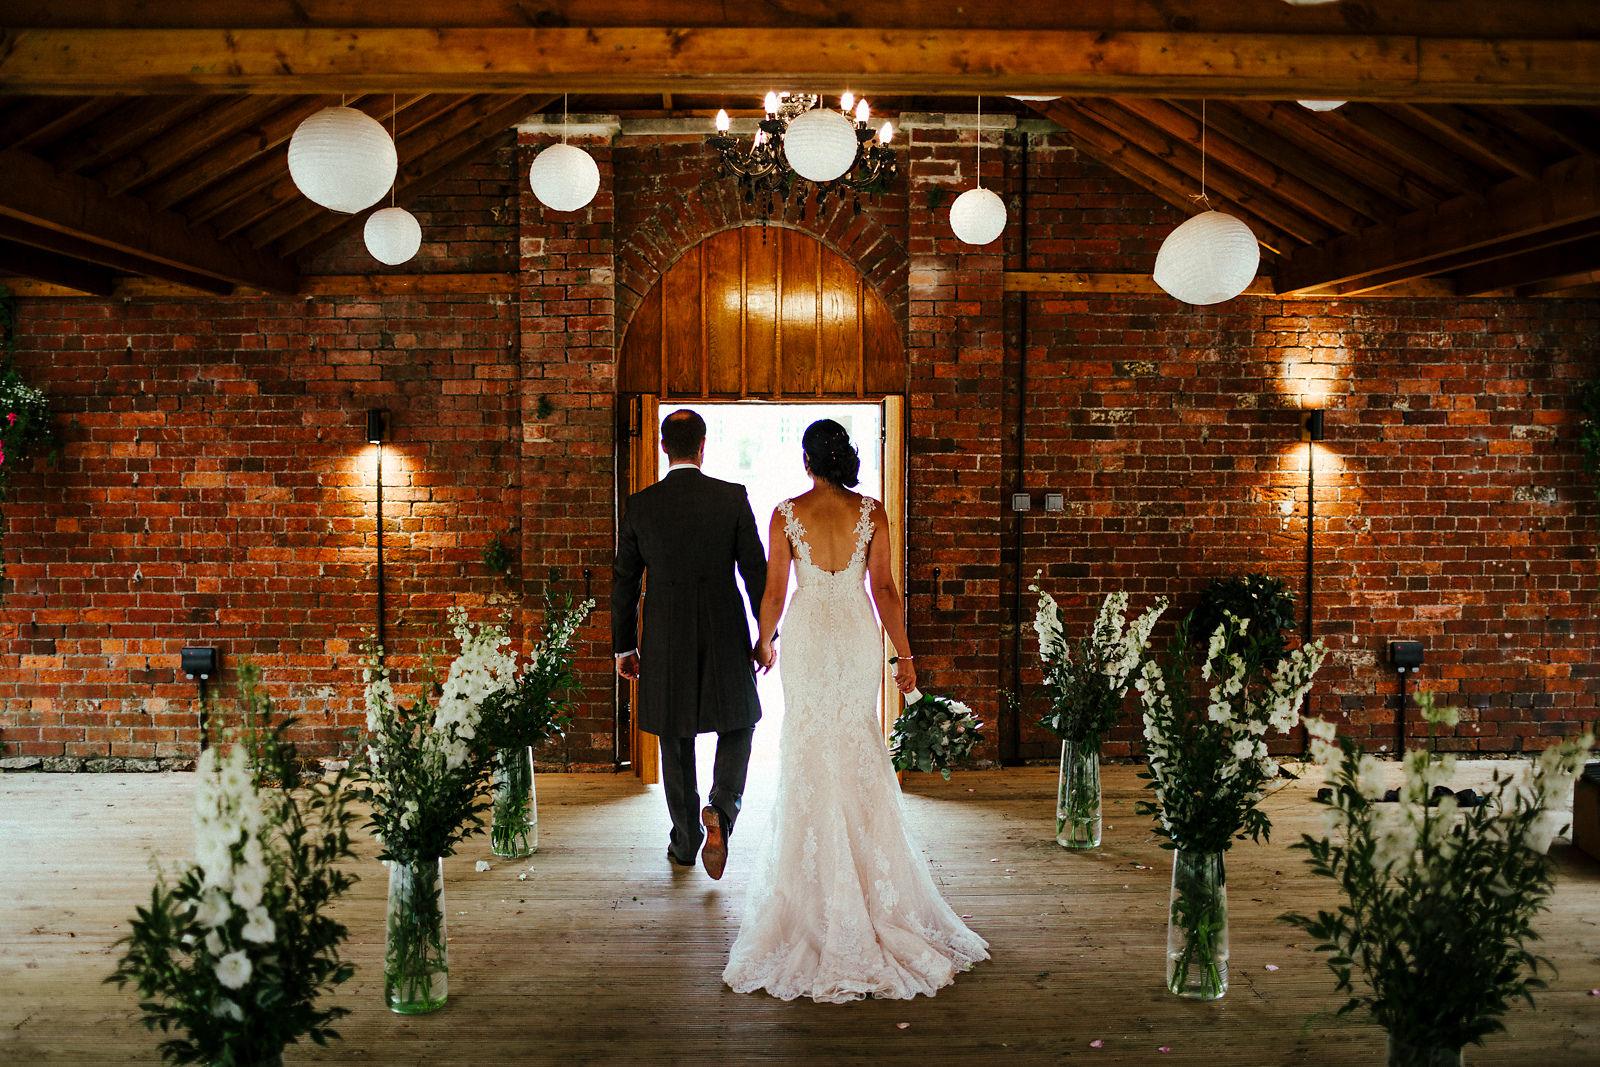 Orchardleigh Walled Garden wedding photography